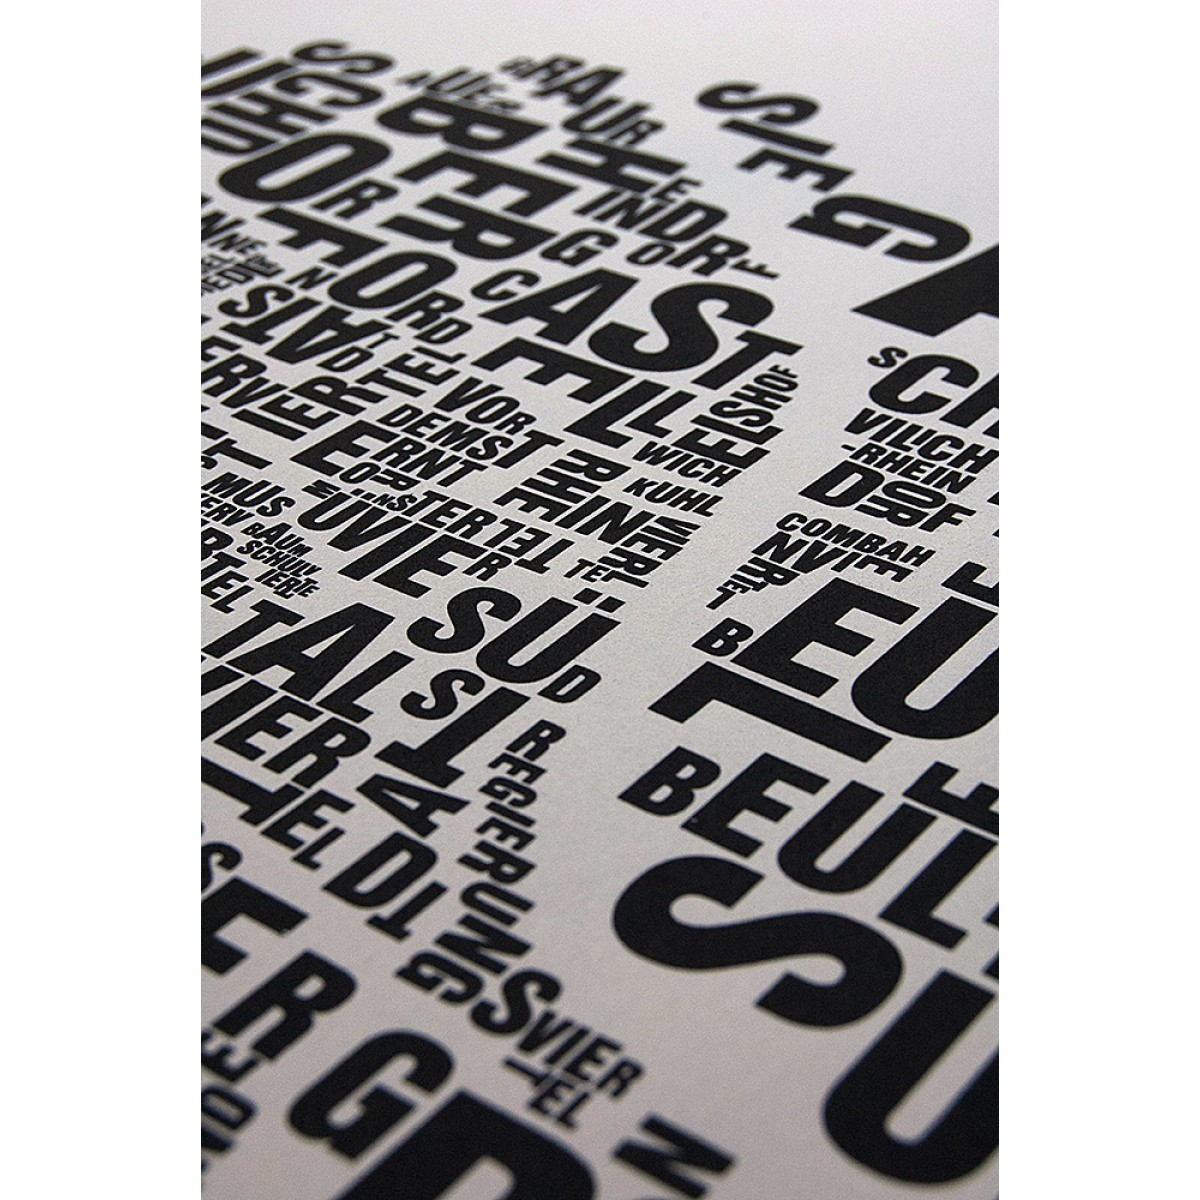 Buchstabenort Bonn Stadtteile-Poster Typografie